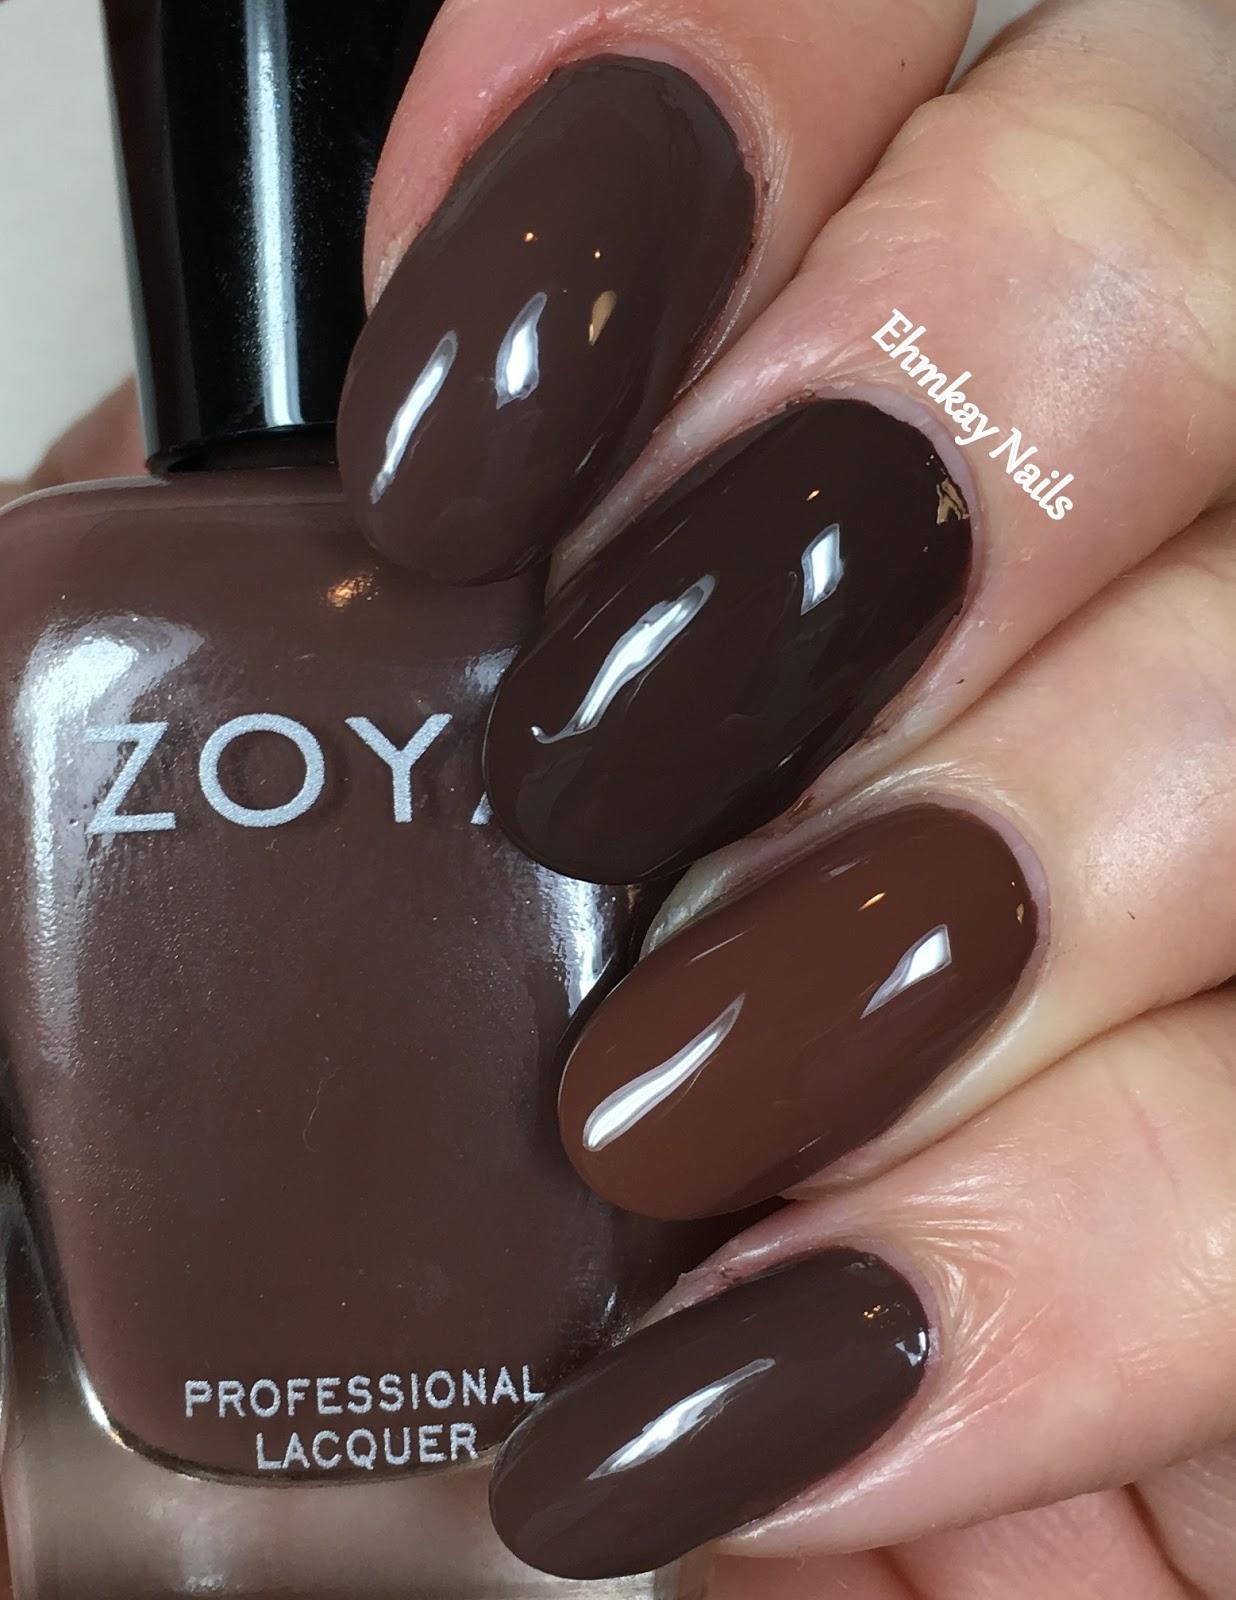 Ehmkay nails zoya naturel 3 comparisons zoya desiree vs zoya nyssa reheart Images